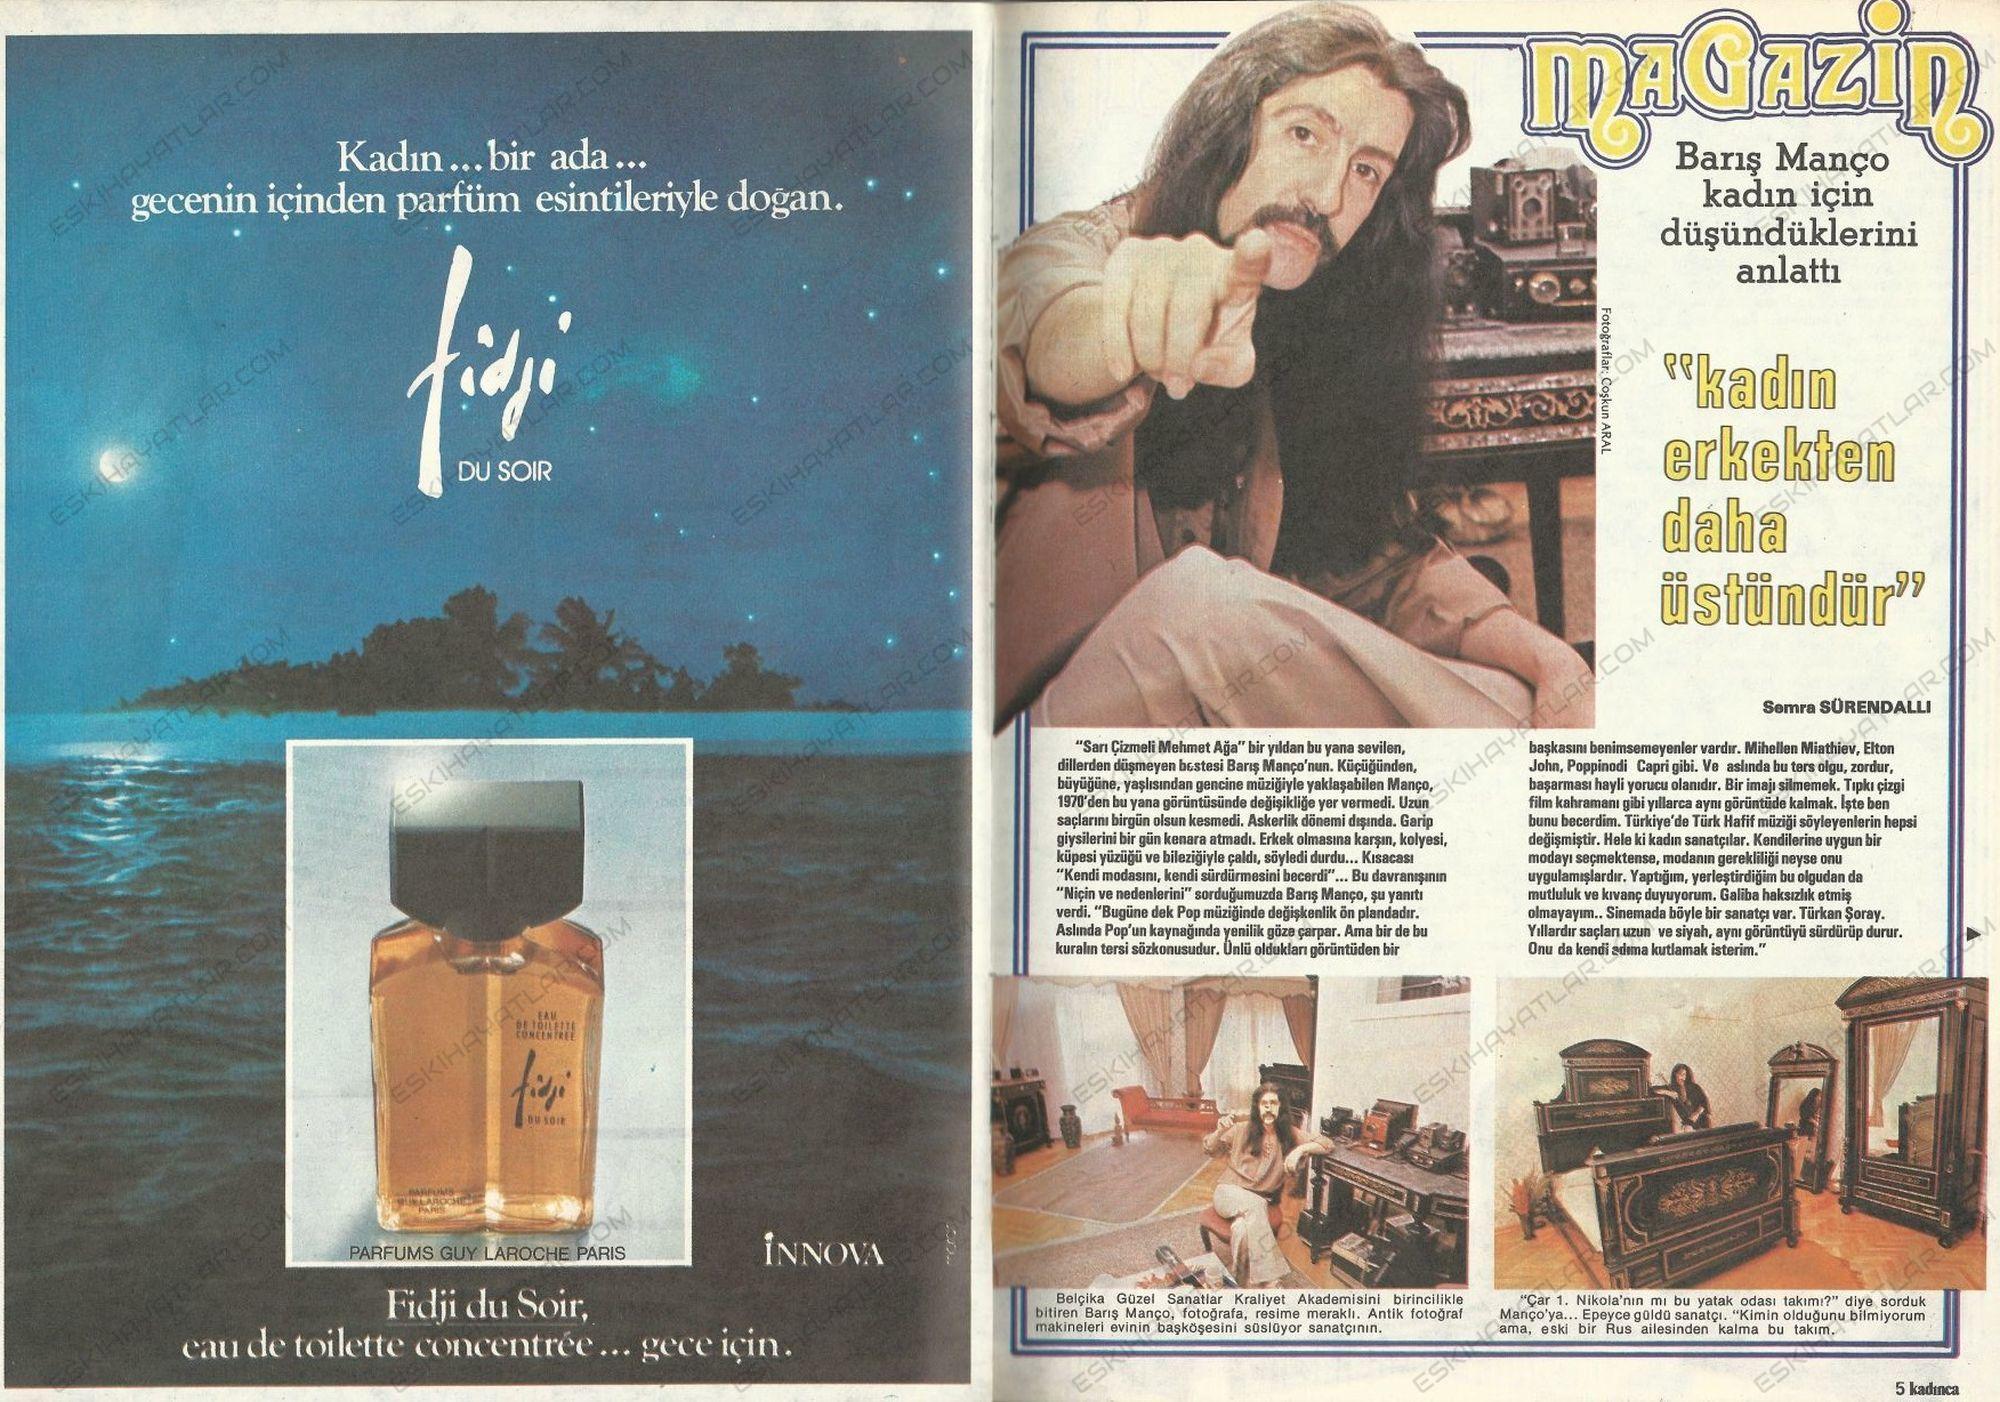 baris-manco-roportaji-1980-kadinca-dergisi-arsivleri (5)